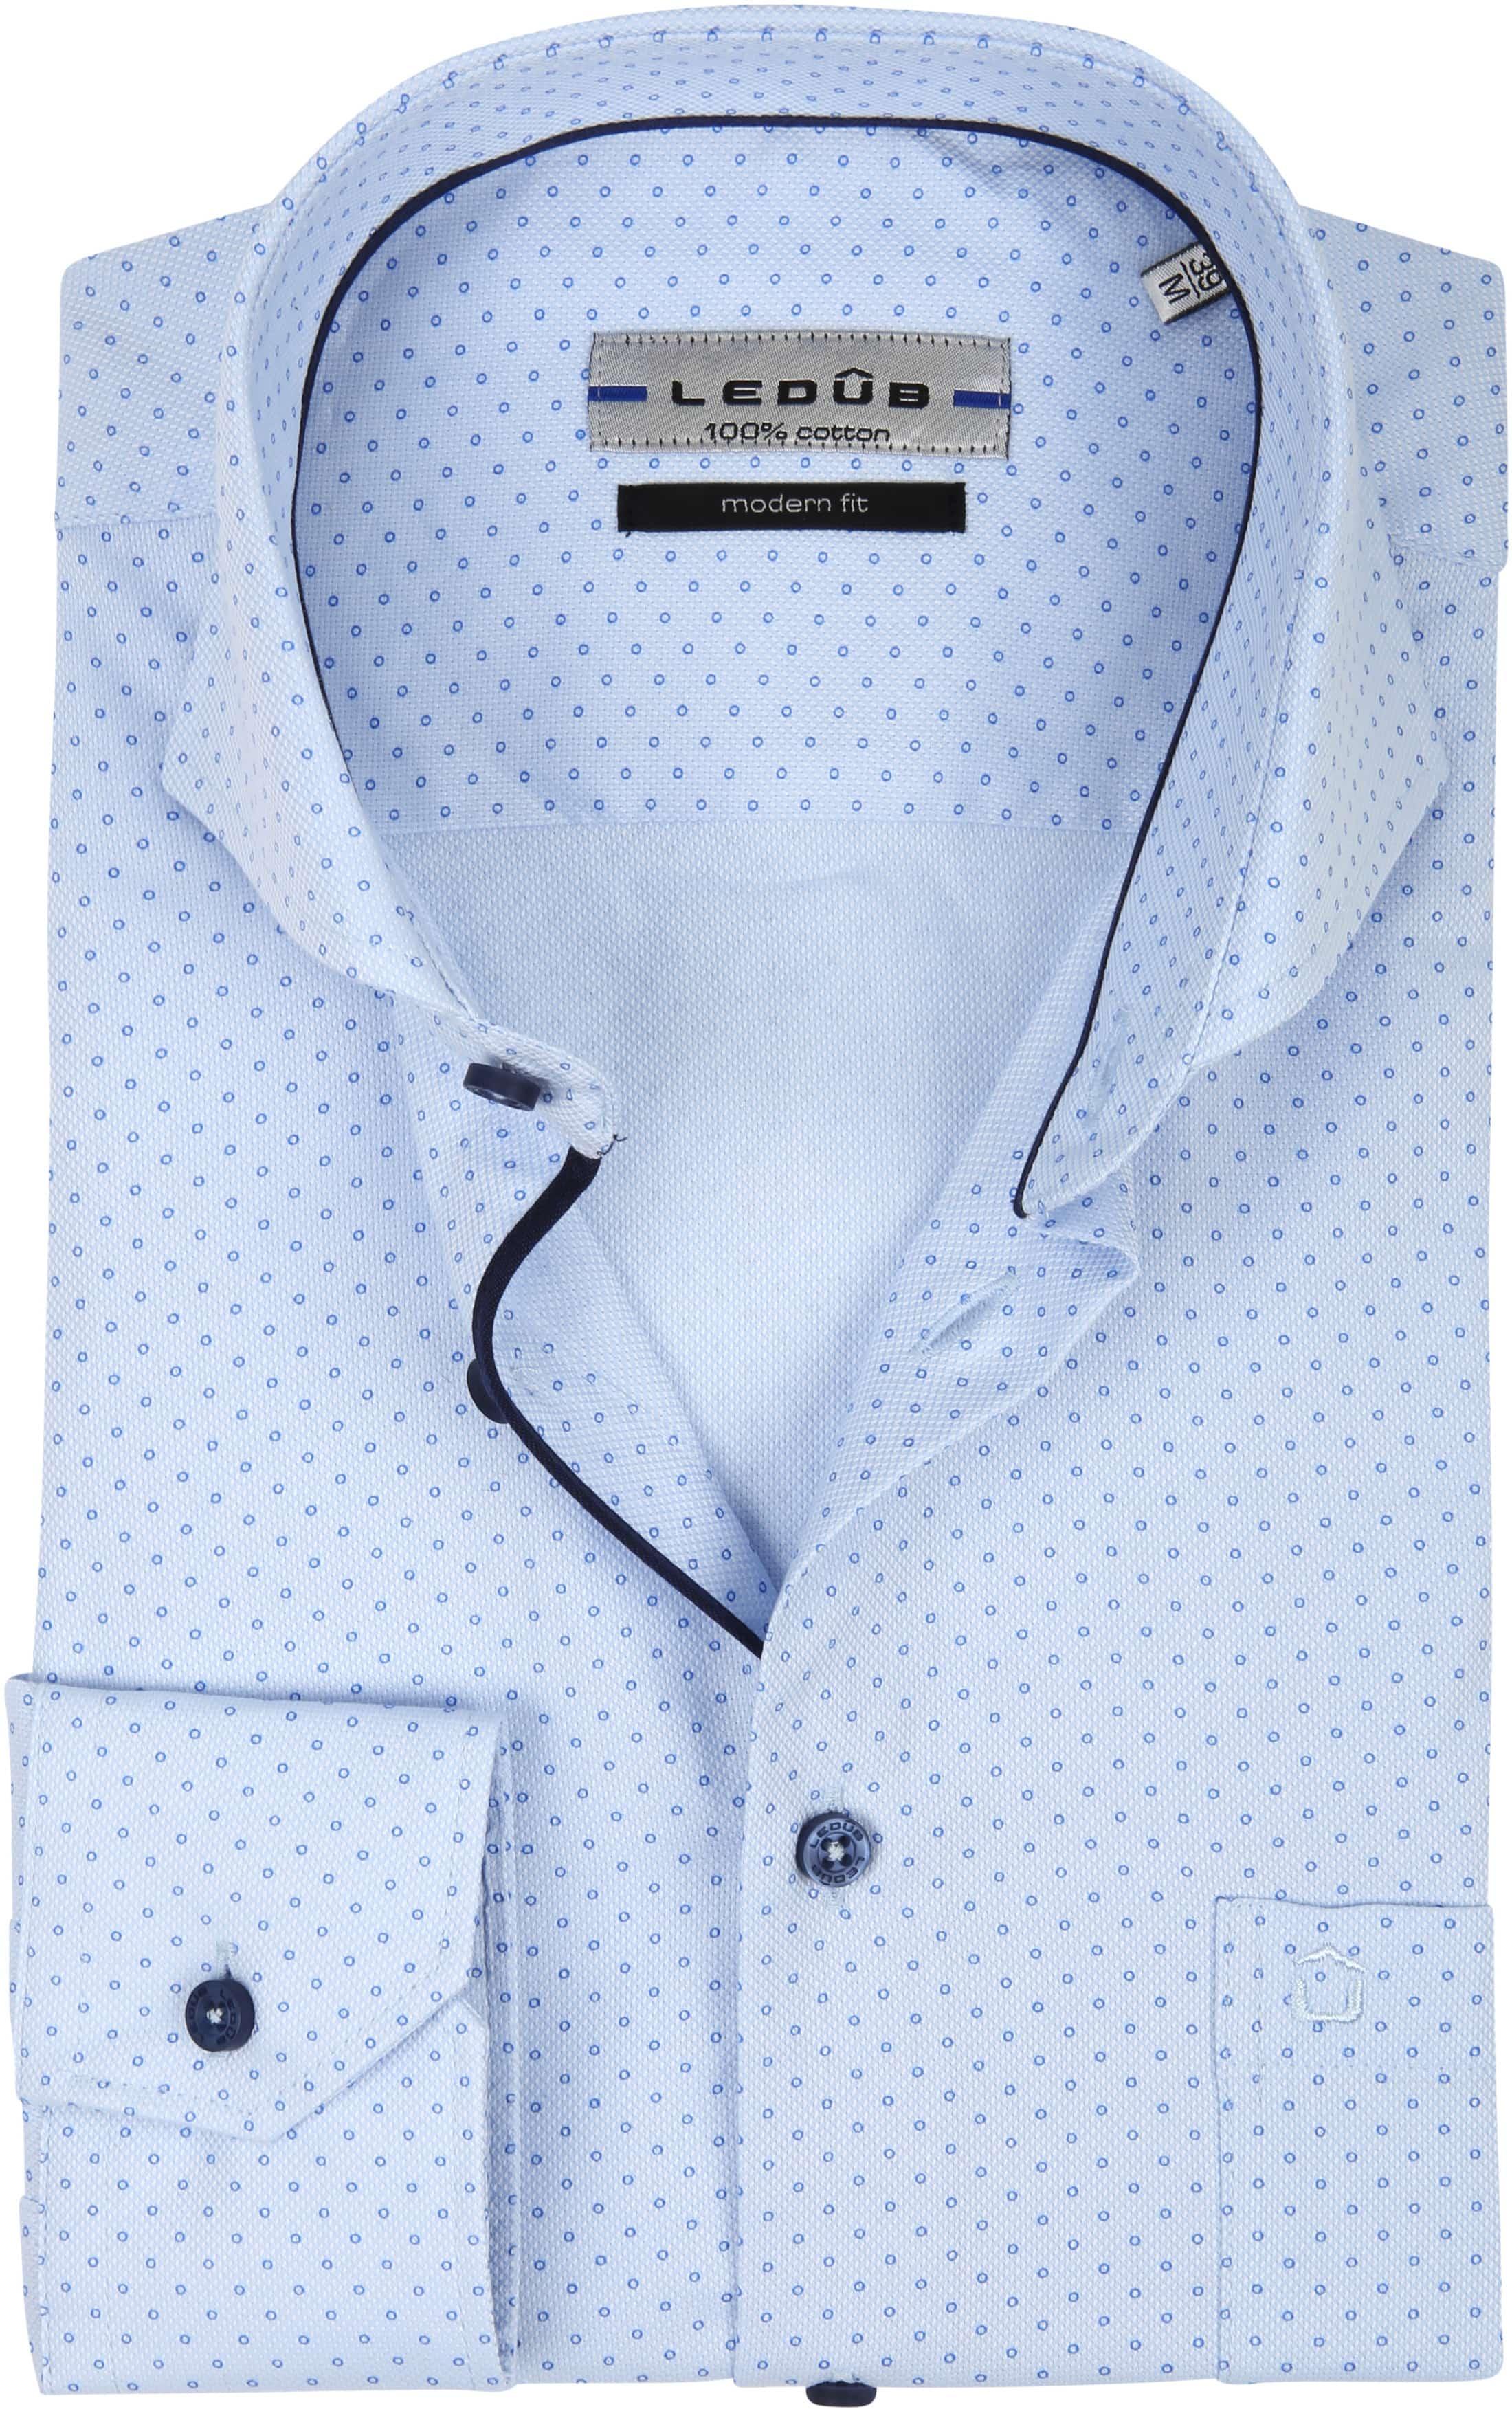 Ledub Overhemd MF Cirkel Blauw foto 0